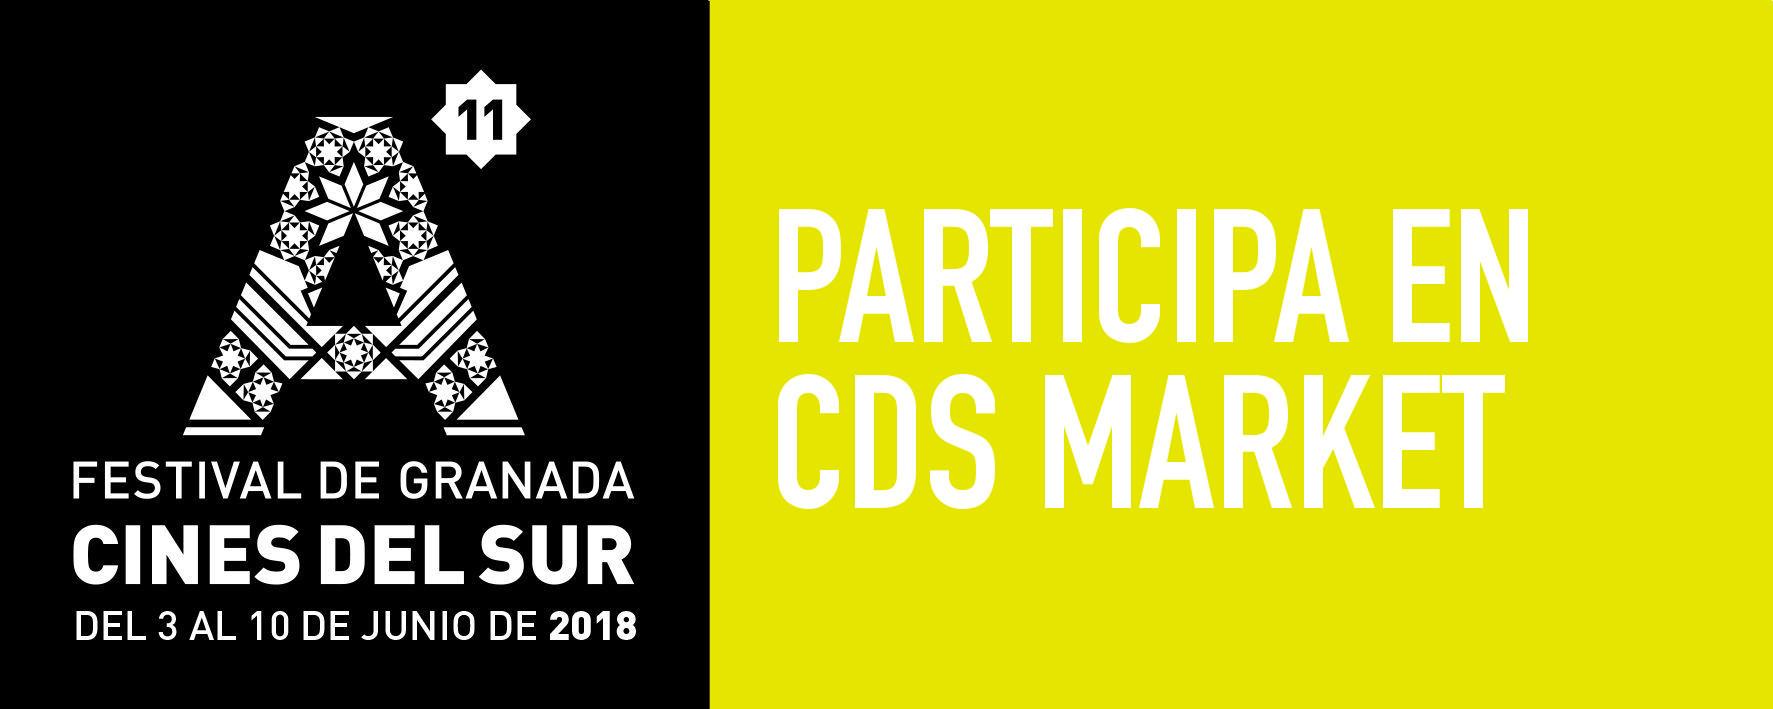 Partcipa CDS Market